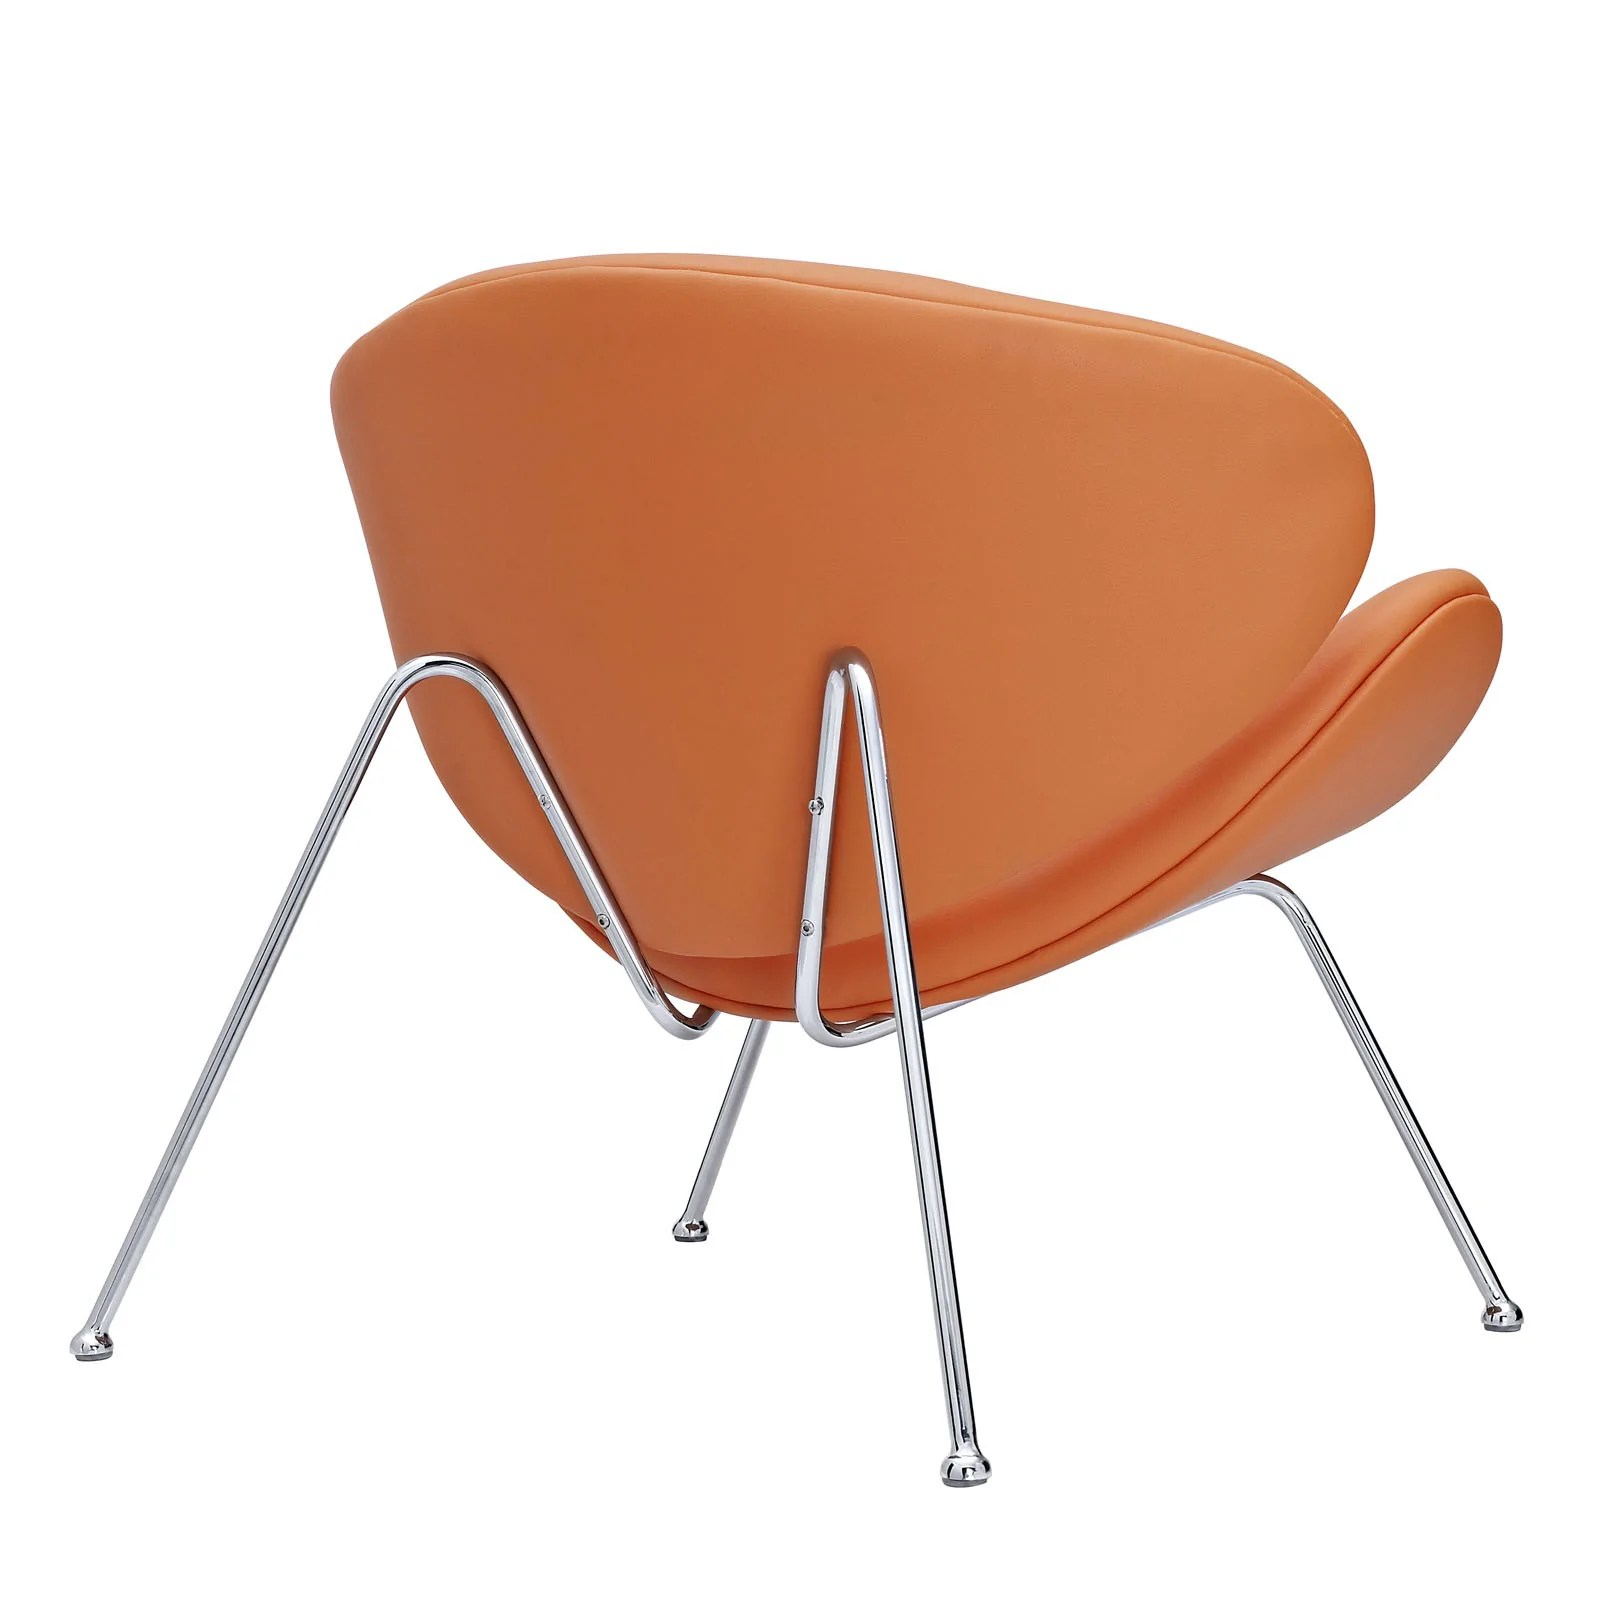 orange slice chair vanguard furniture dining chairs pierre paulin the modern source 4